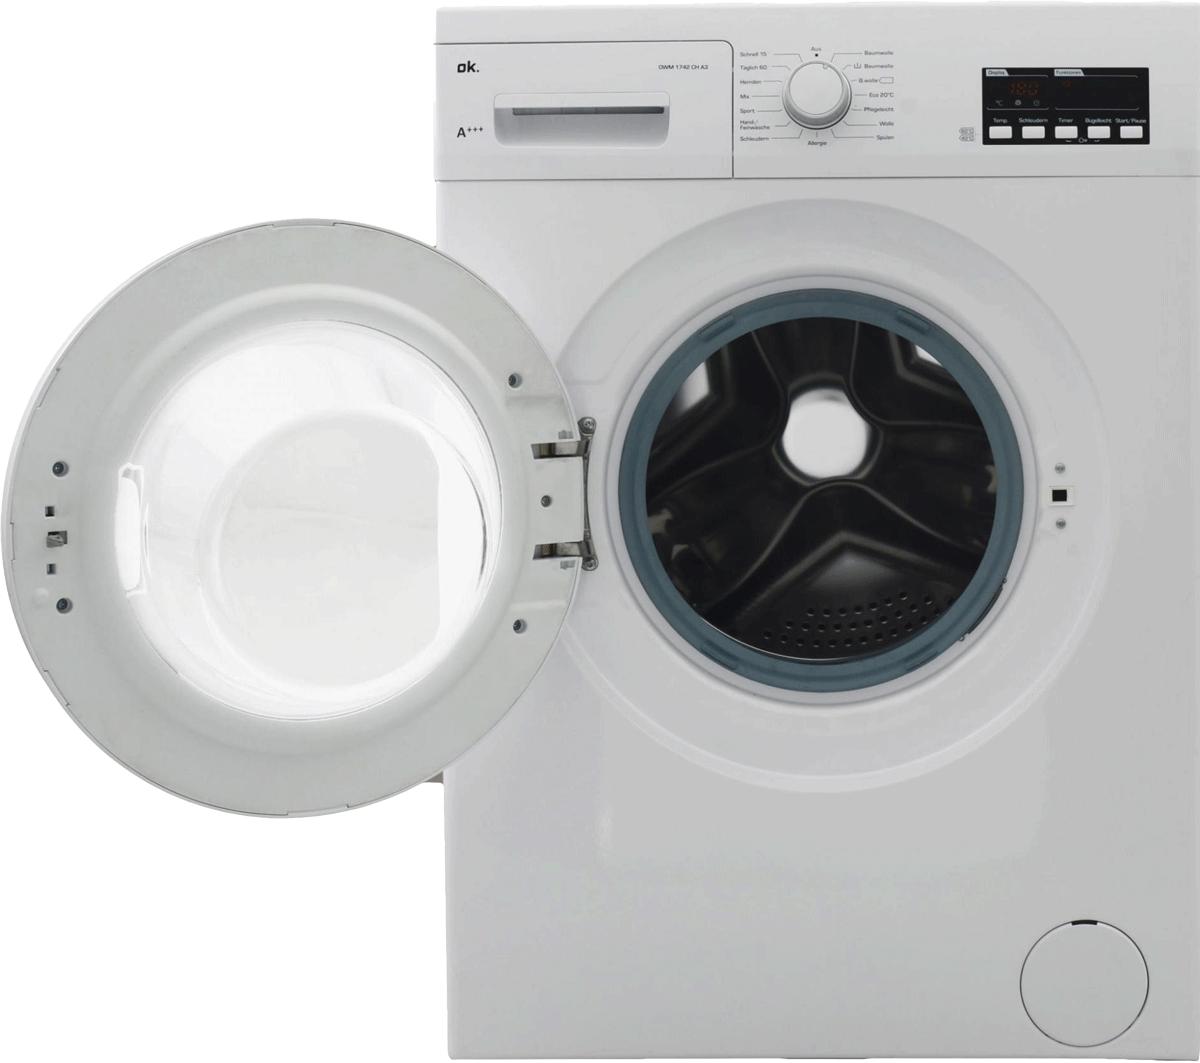 ok owm 1742 ch a3 waschmaschine frontlader energieeffizienzklasse a weiss g nstig. Black Bedroom Furniture Sets. Home Design Ideas